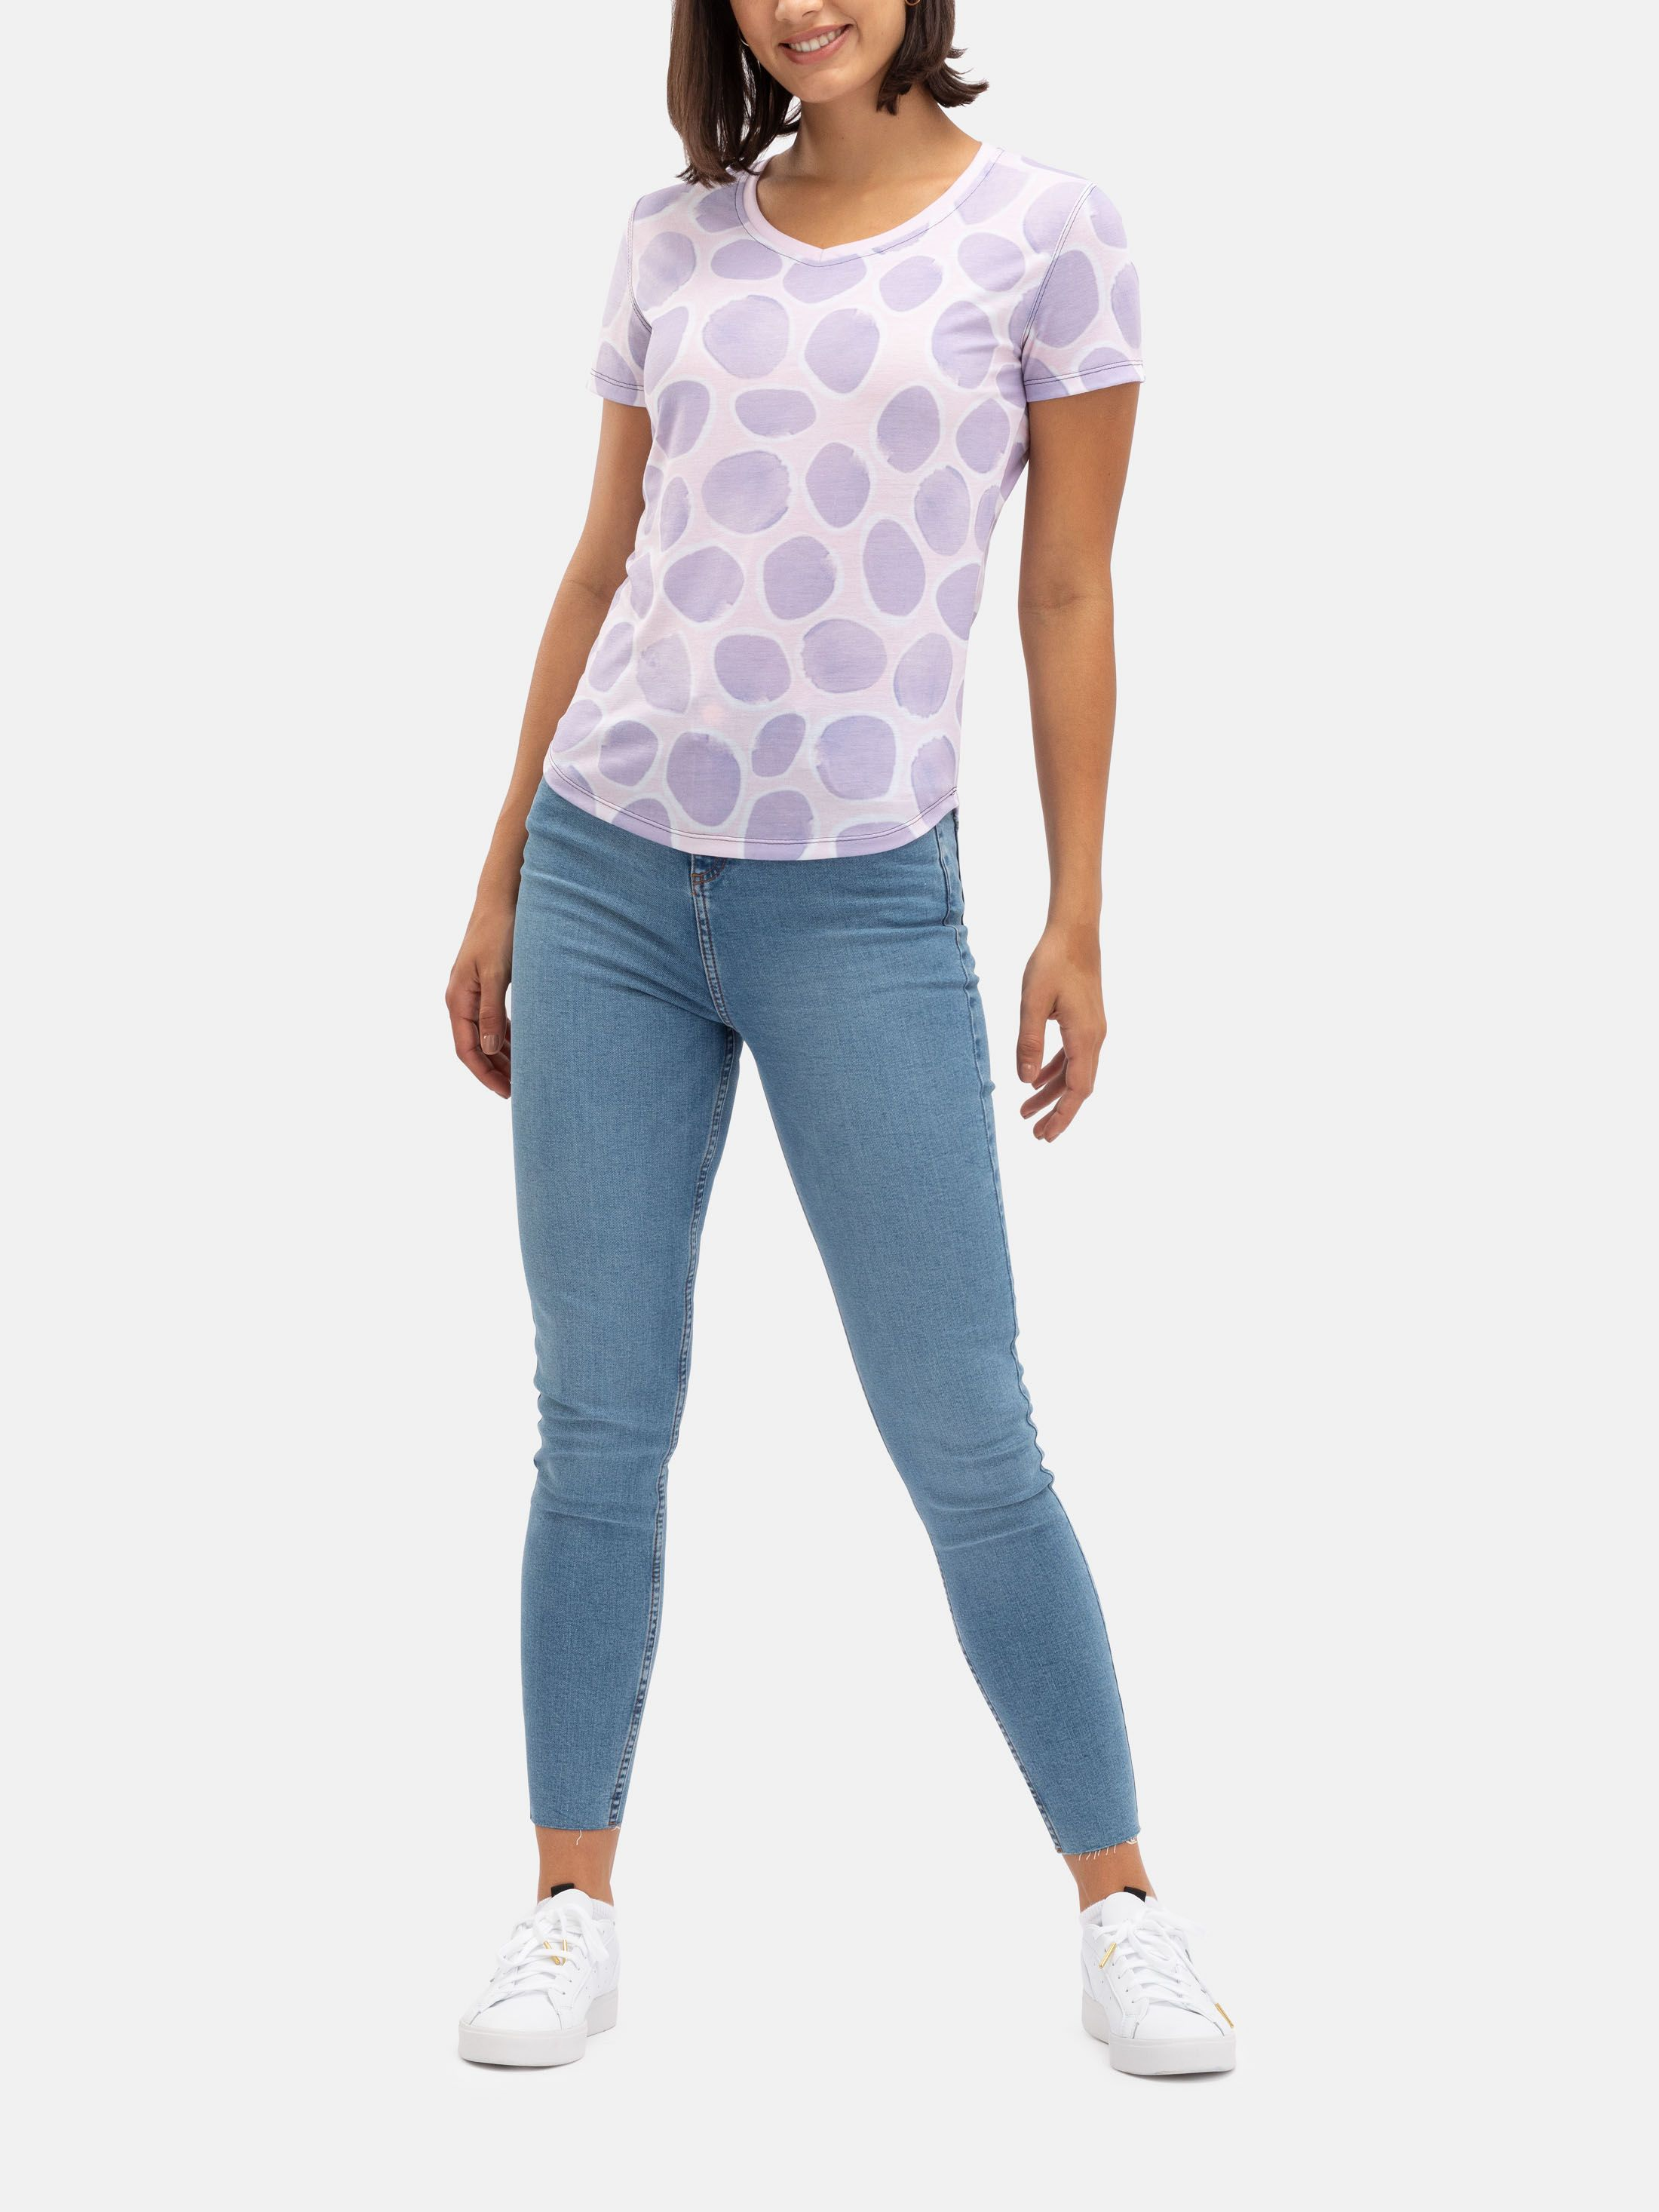 Womens Custom V-Neck Printed T Shirts